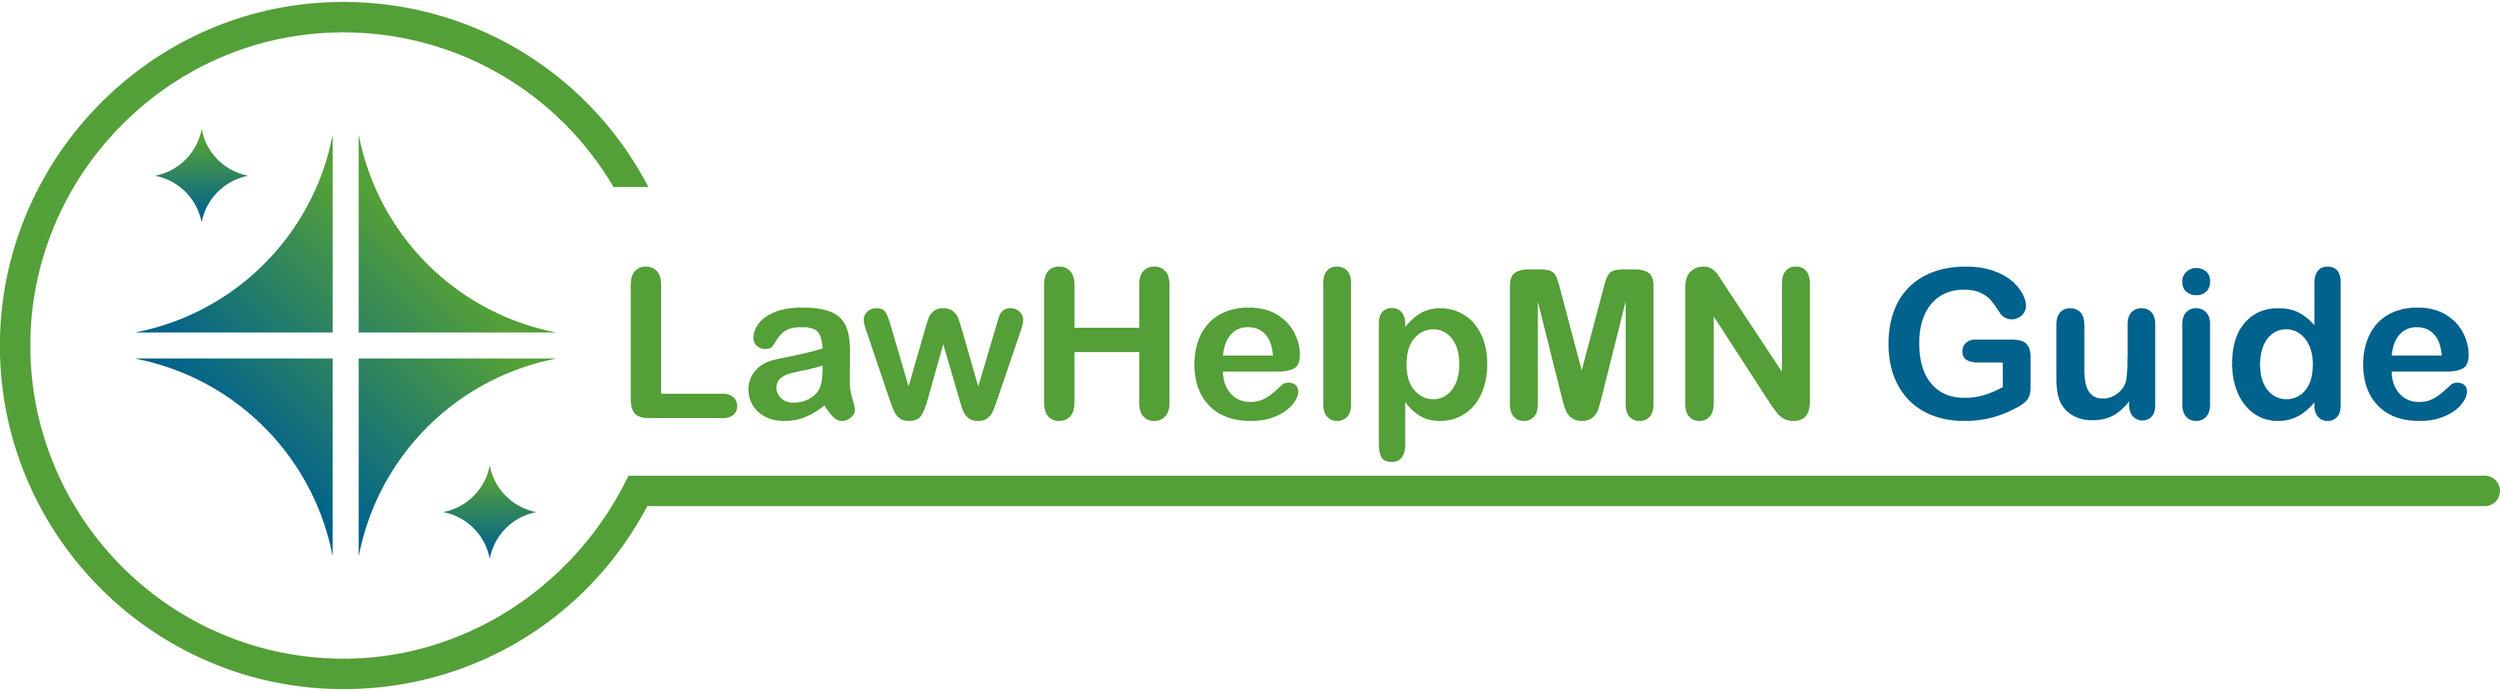 LawHelpMN Guide Logo-01.jpg